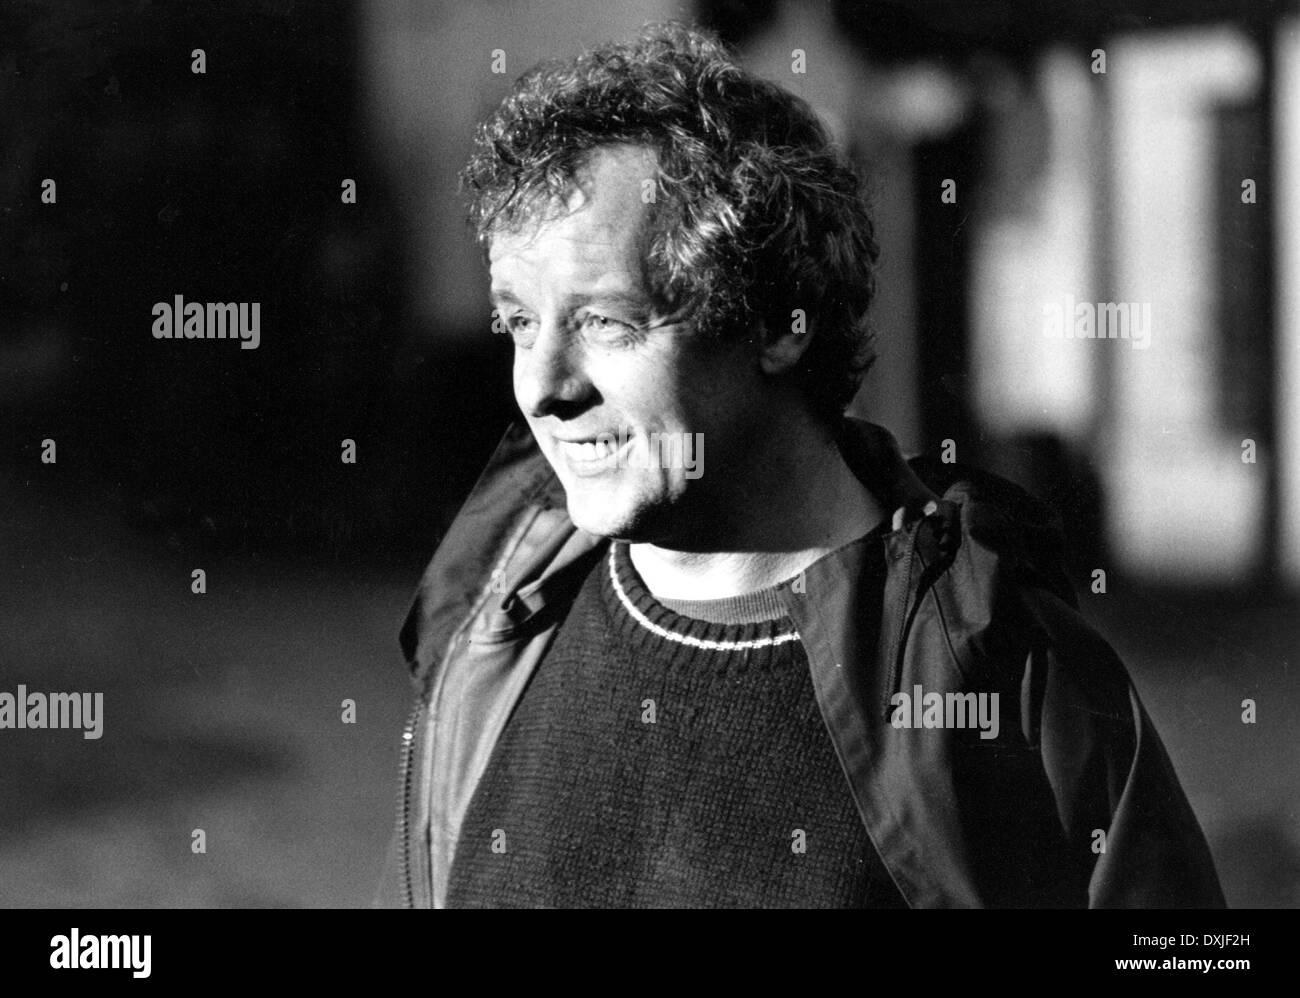 THE FIELD (EIRE/UK 1995) DIRECTOR, JIM SHERIDAN - Stock Image